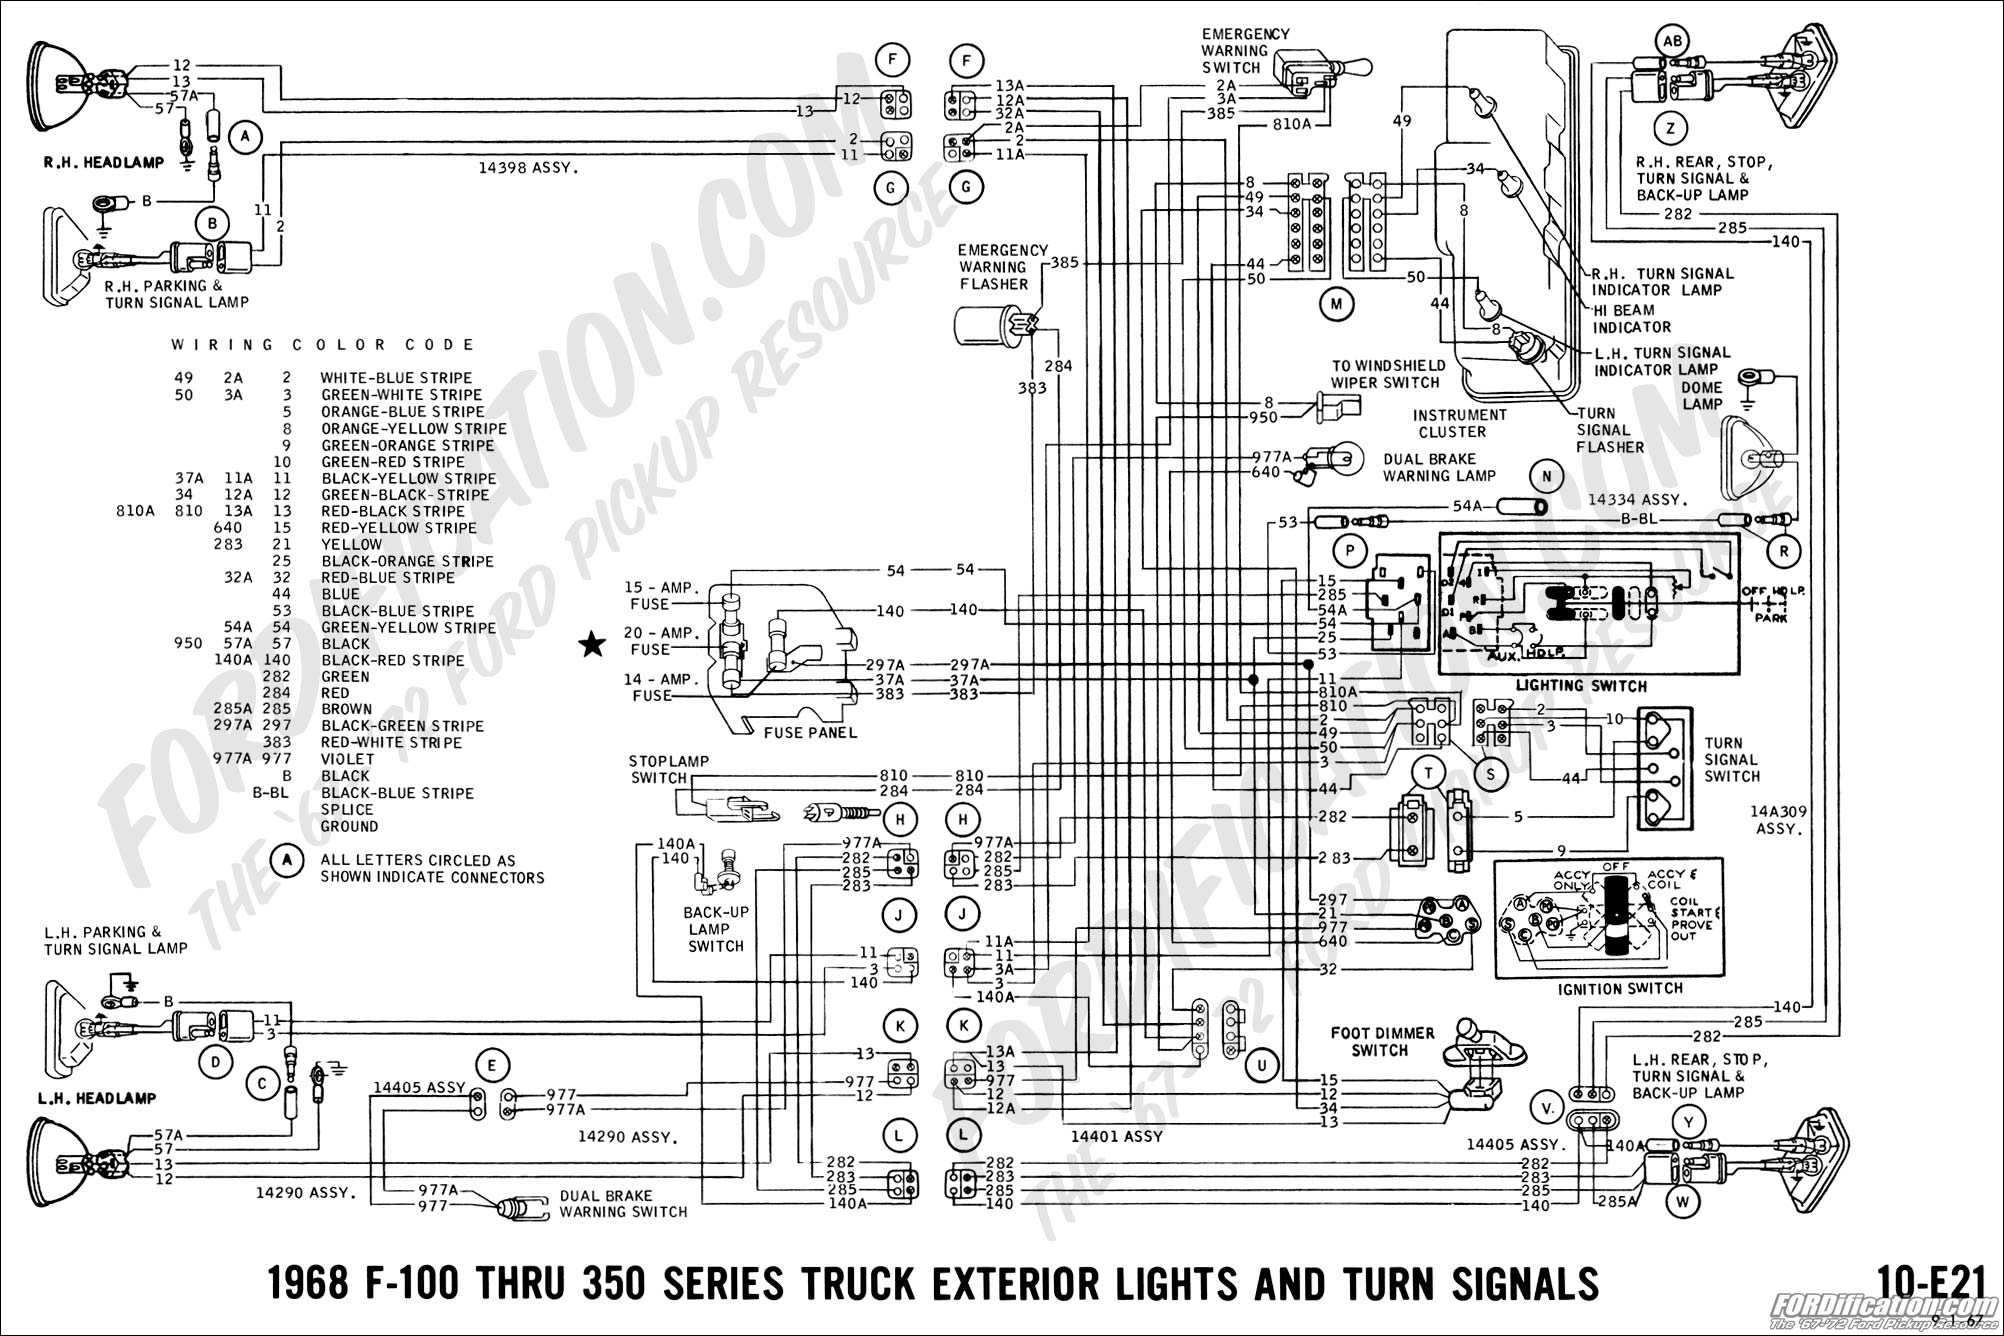 Superb Ford Pinto Wiring Harness Basic Electronics Wiring Diagram Wiring Cloud Loplapiotaidewilluminateatxorg